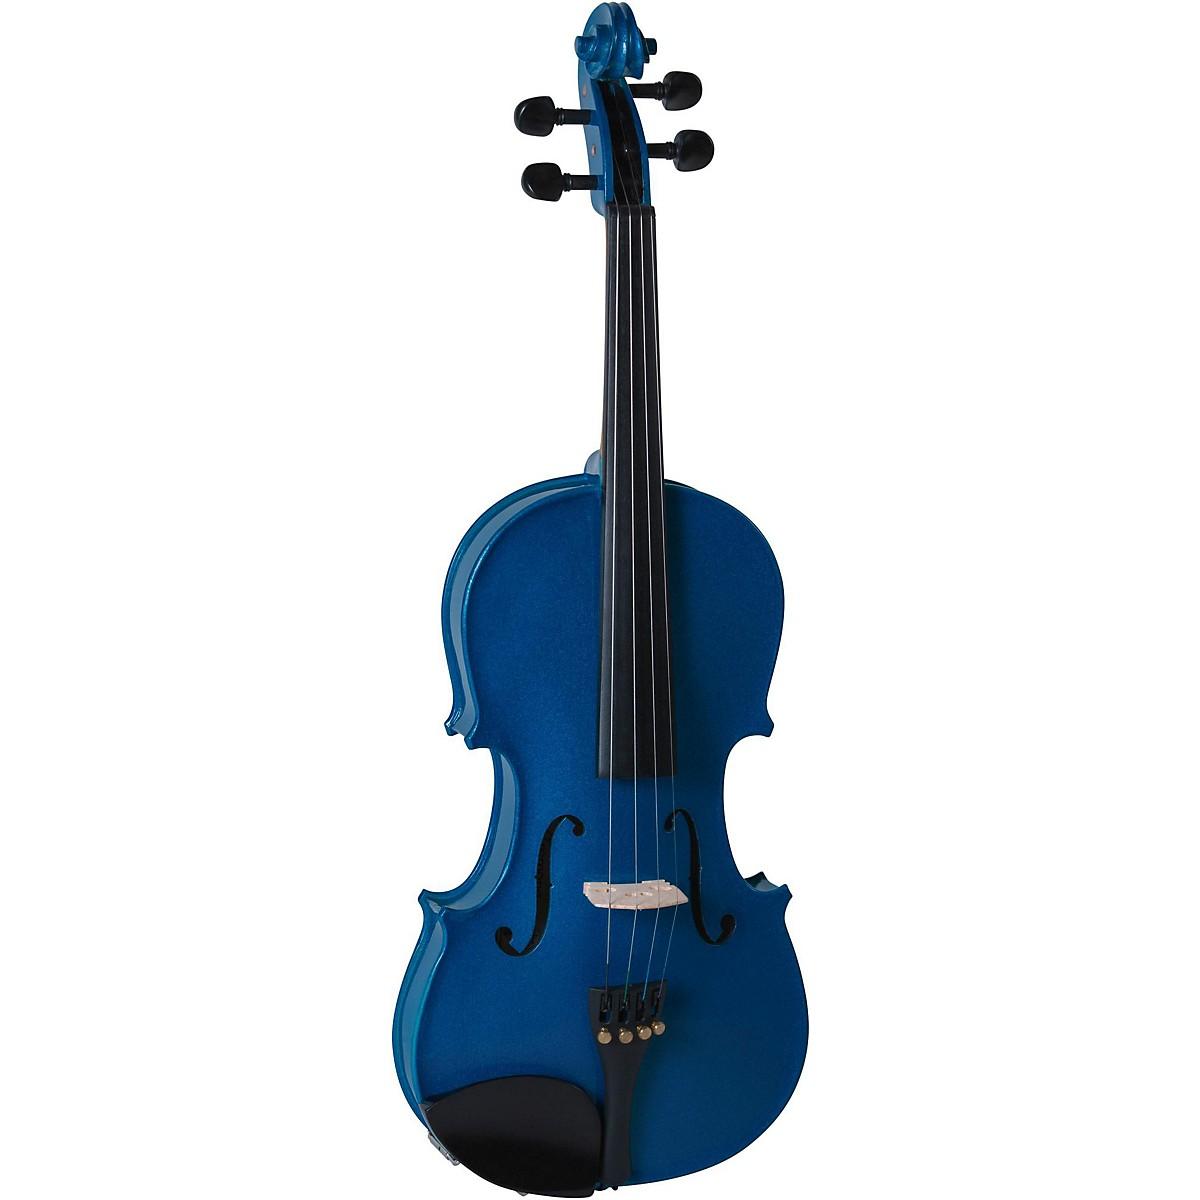 Cremona SV-130BU Series Sparkling Blue Violin Outfit